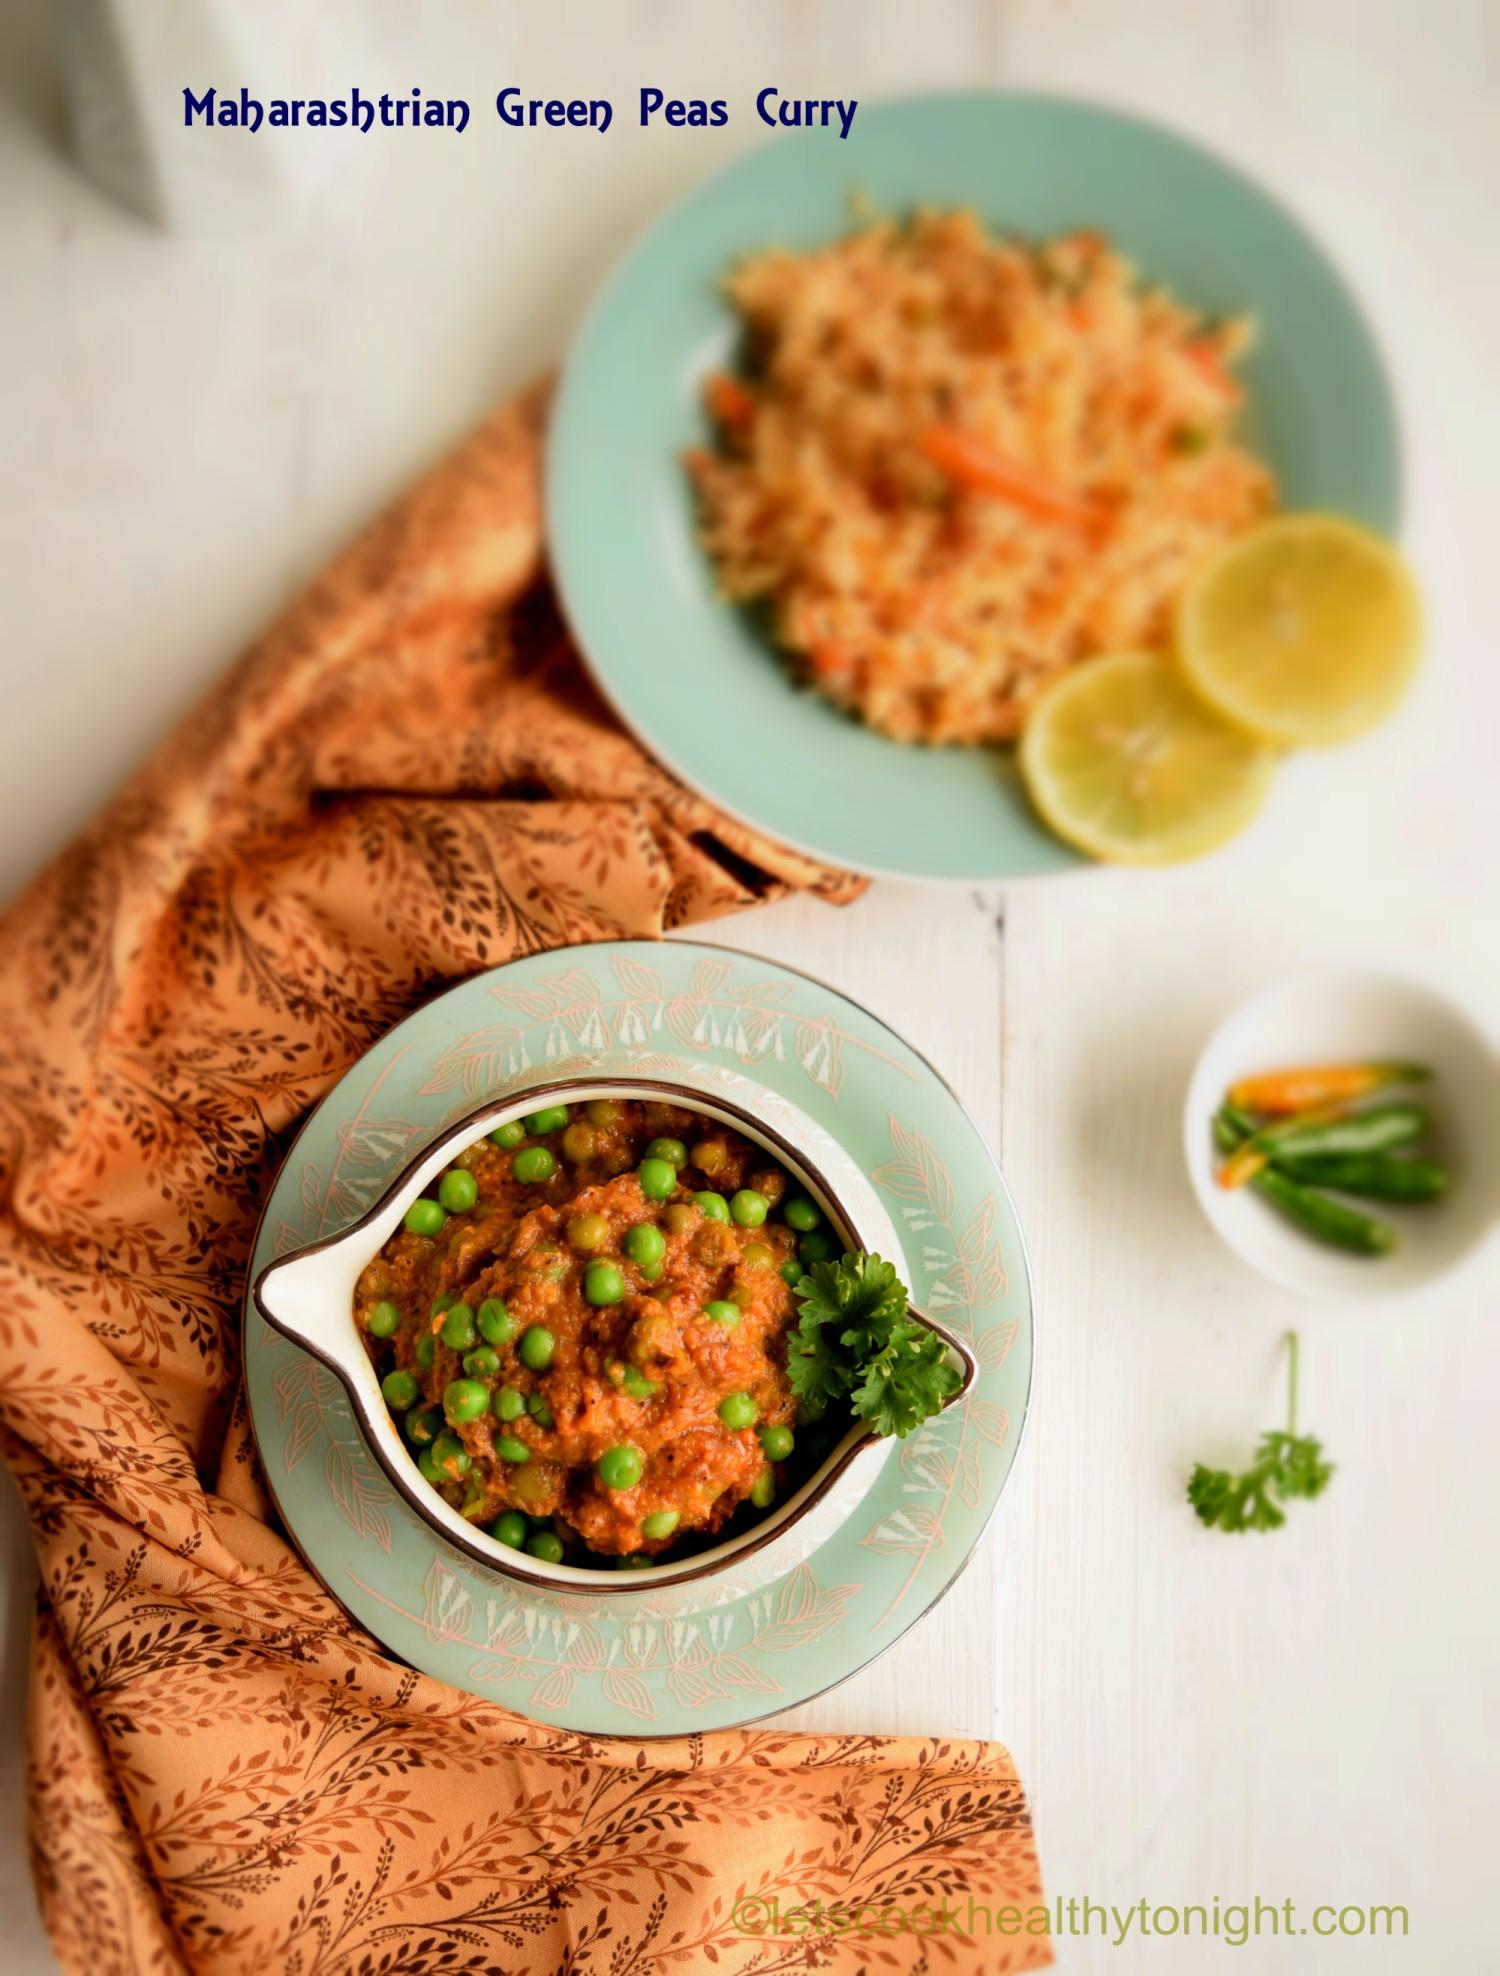 Maharashtrian Green Peas Curry